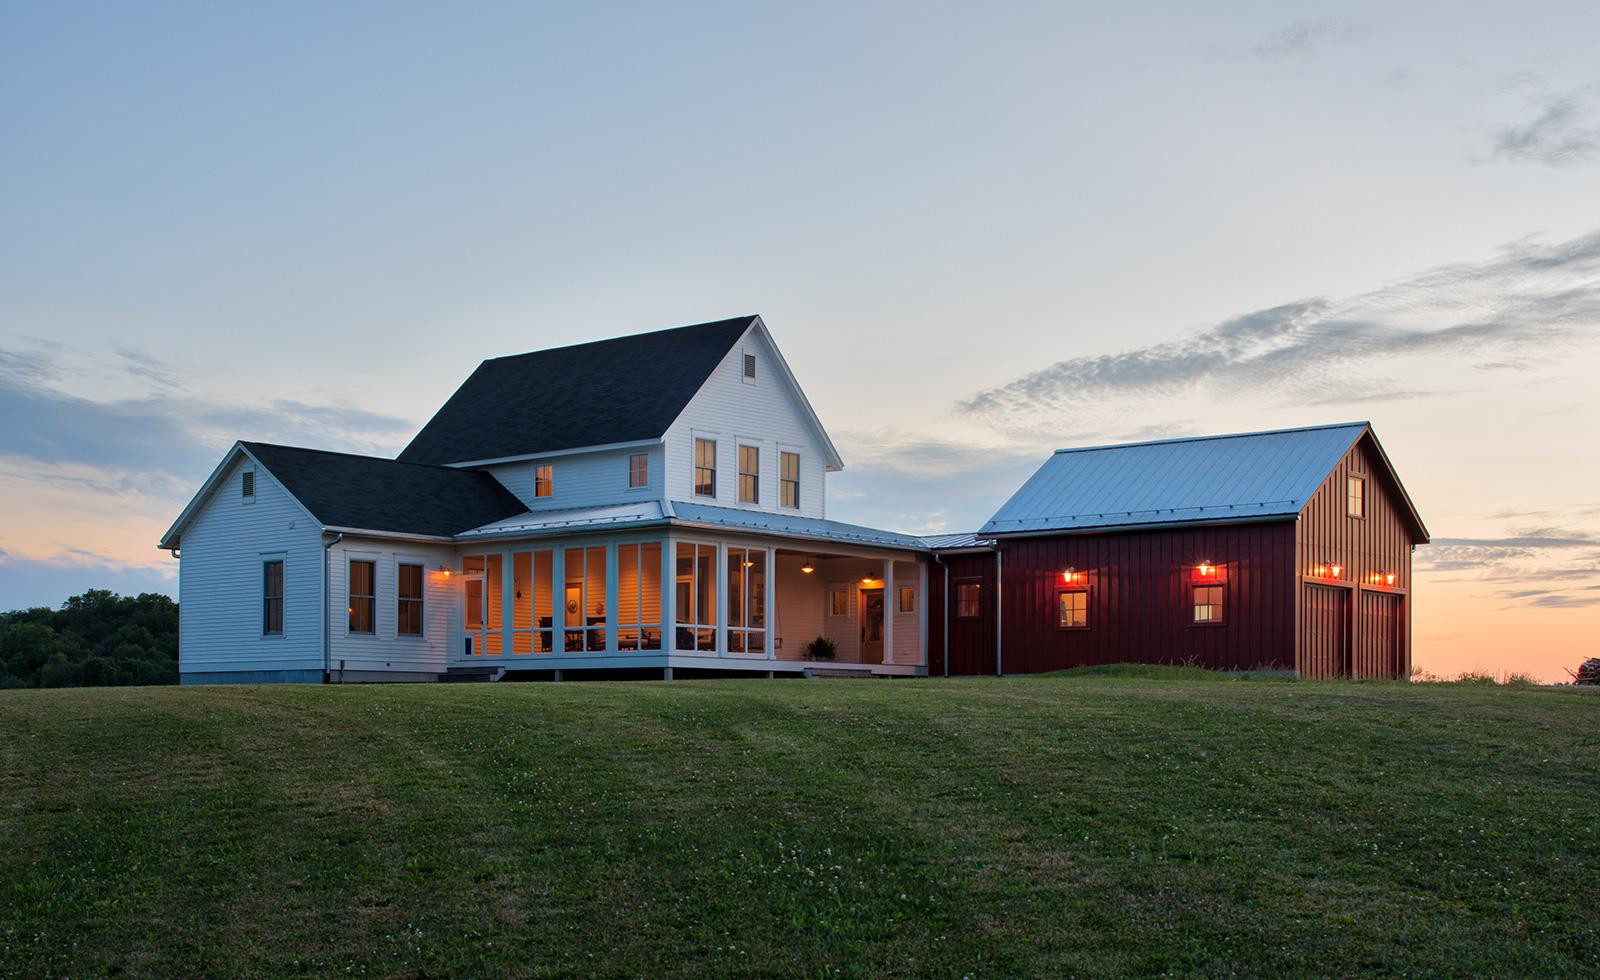 01_IowaFarmhouse.jpg